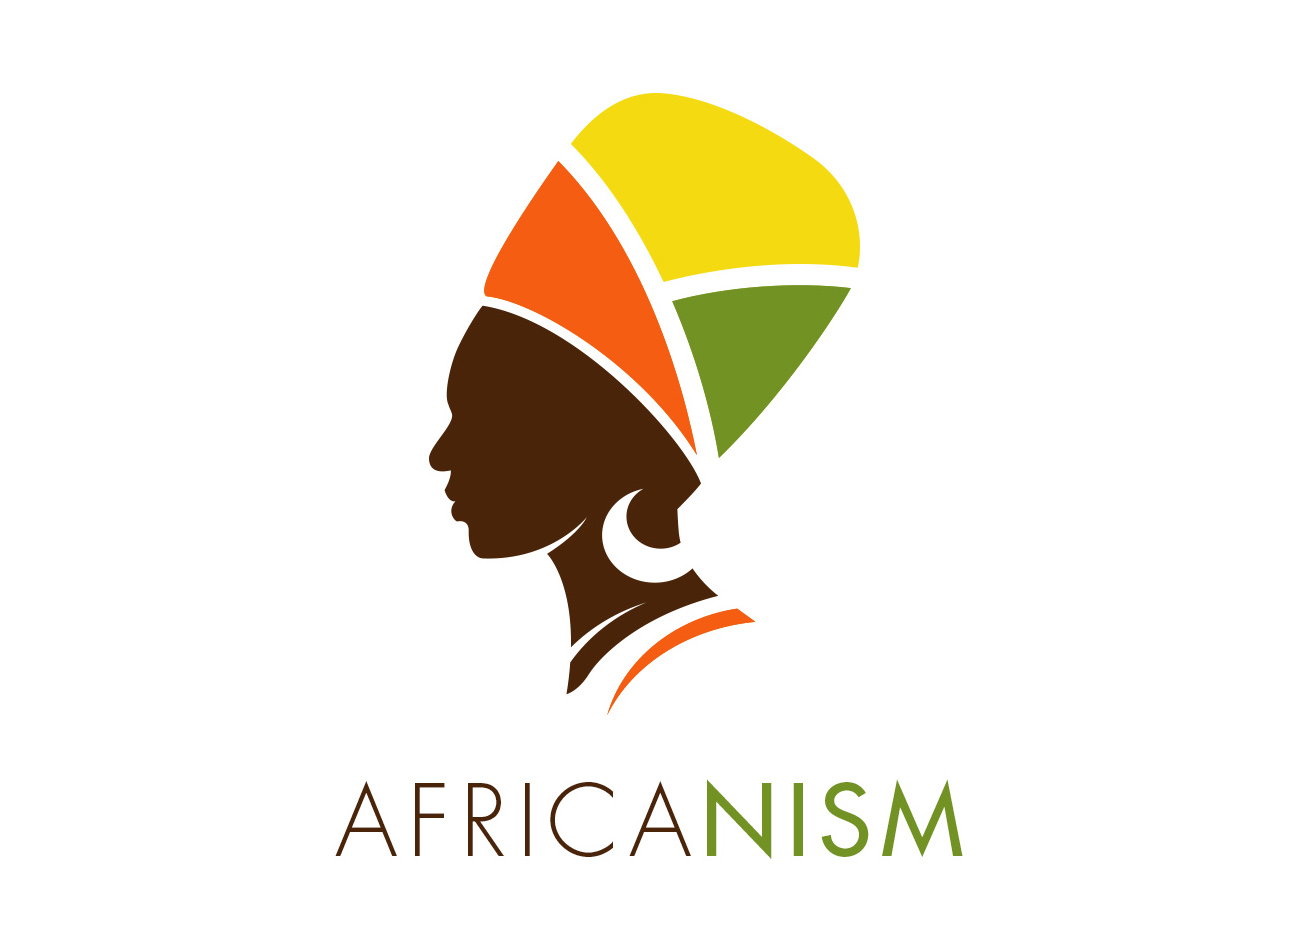 africanism-illustrative-vector-logo.jpg